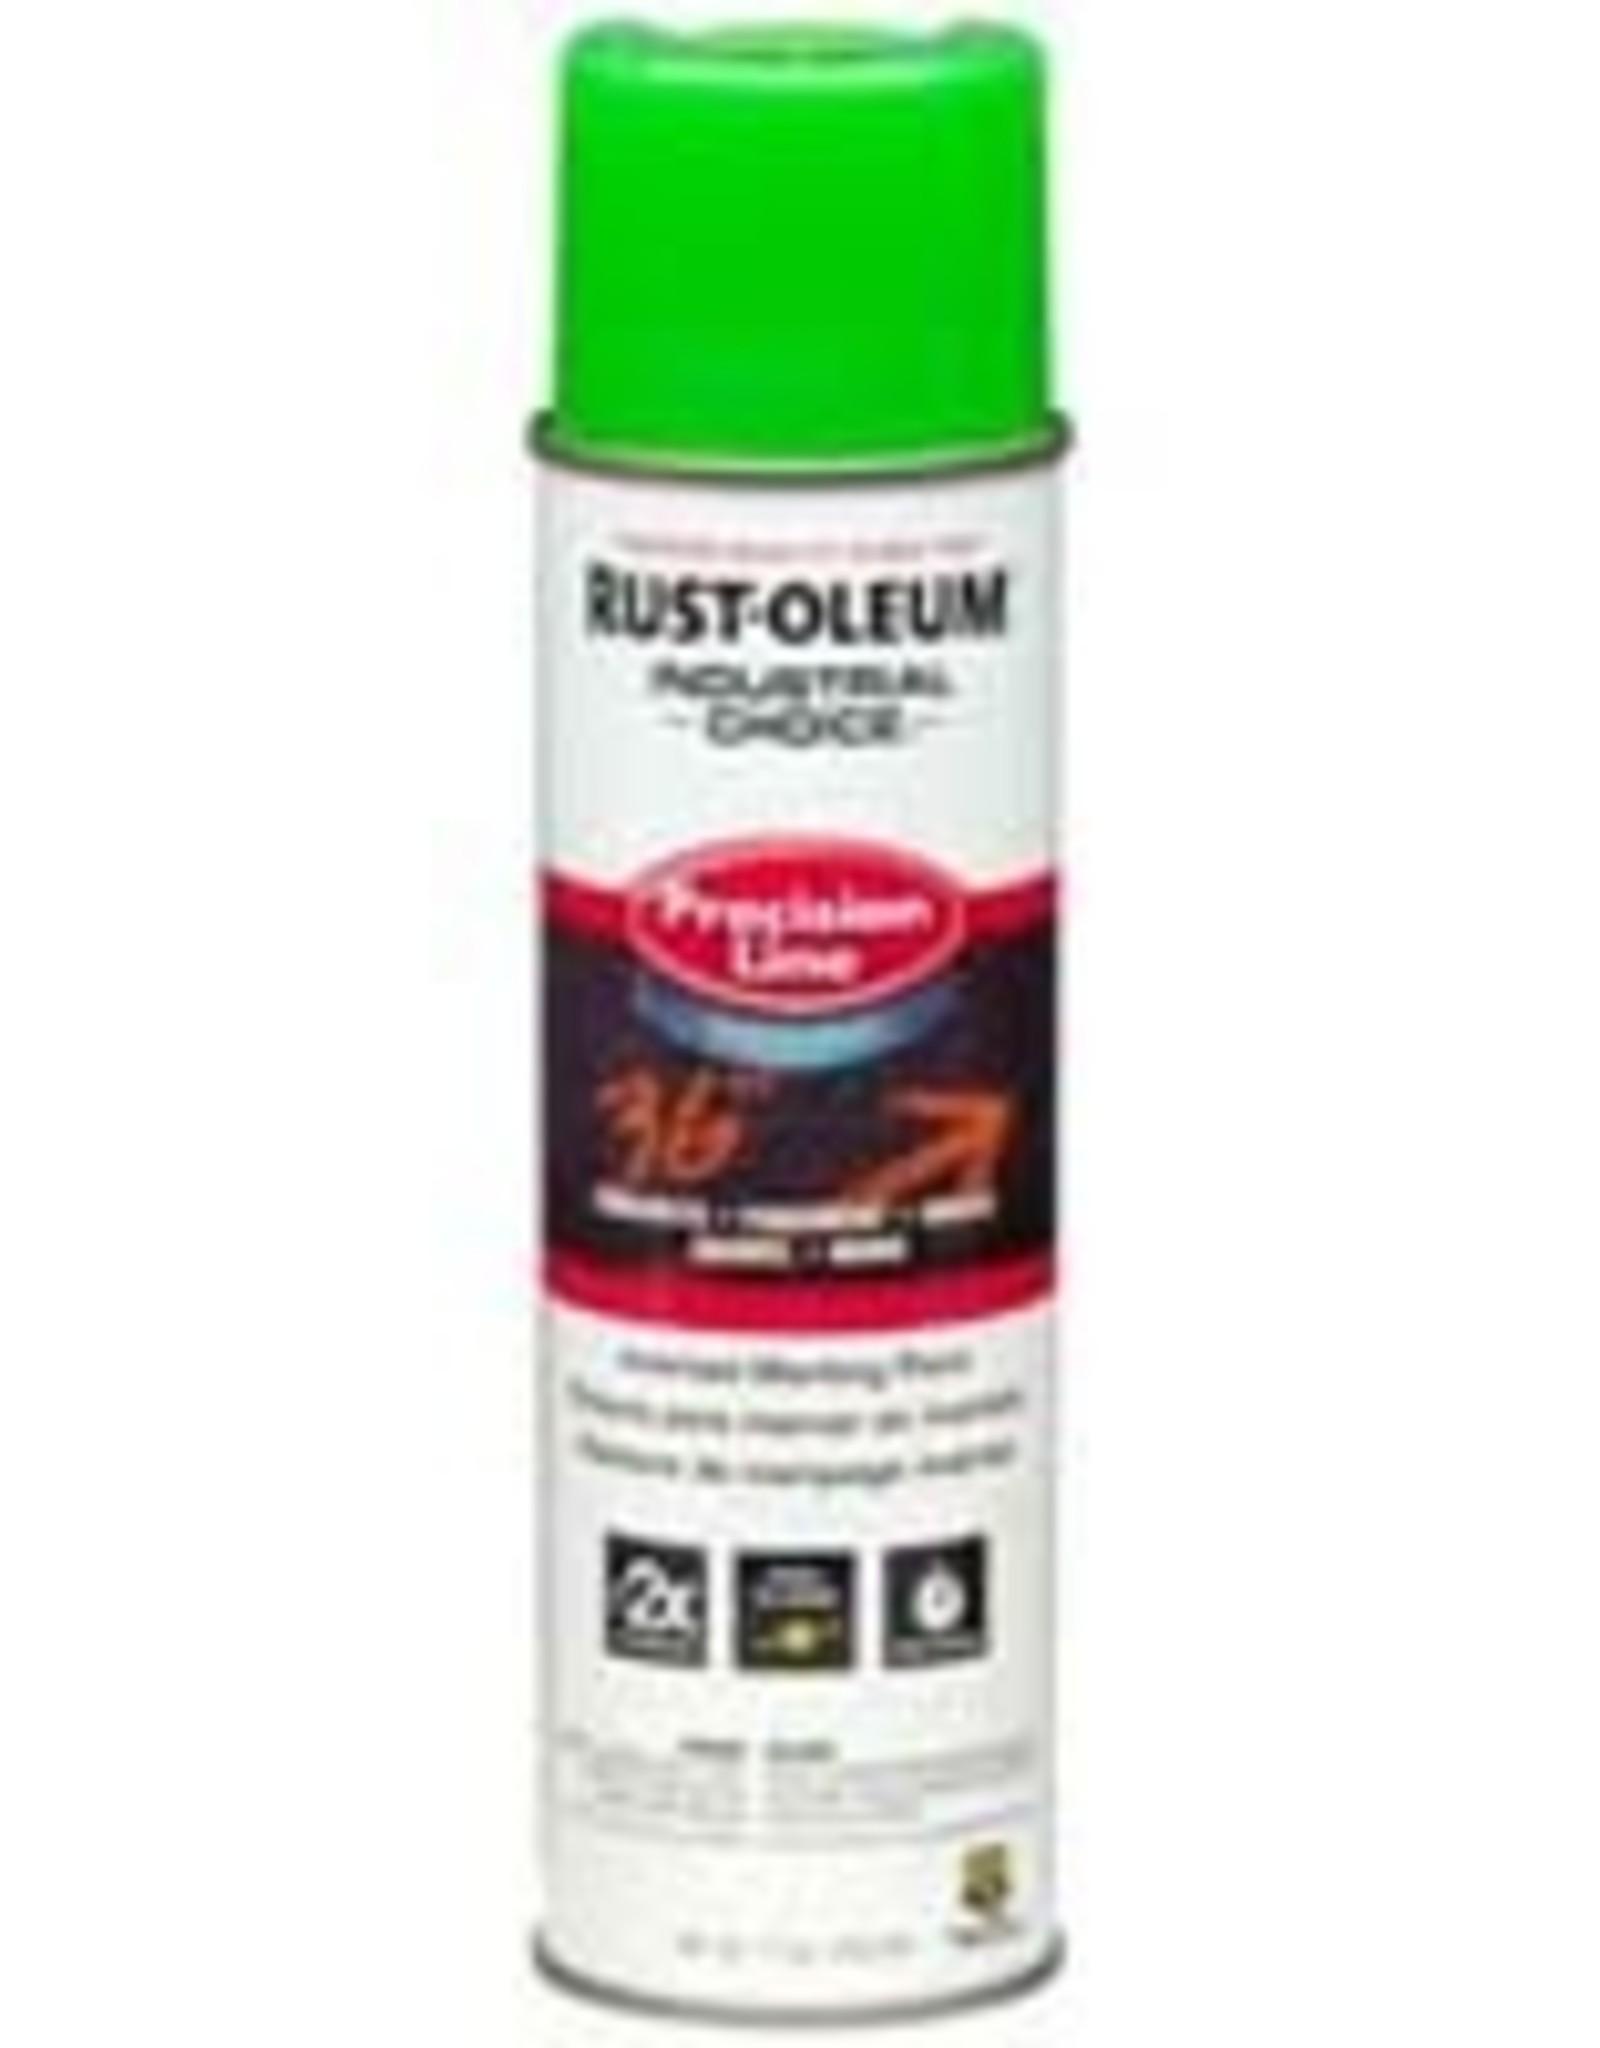 Rust-Oleum Rust-Oleum 203032 17 oz Inverted Marking Paint Flourescent Green